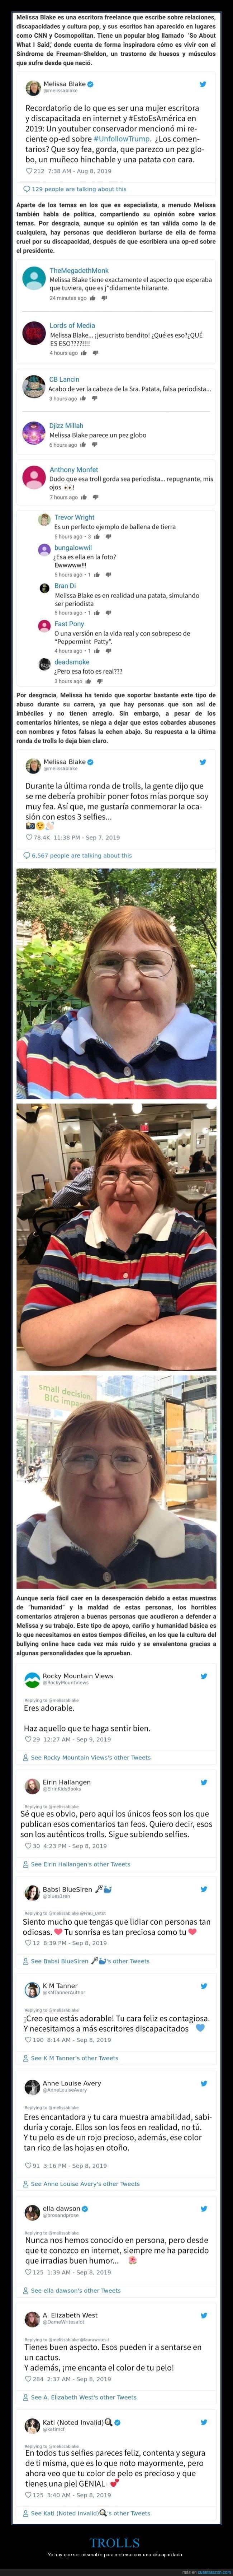 discapacitada,melissa blake,trolls